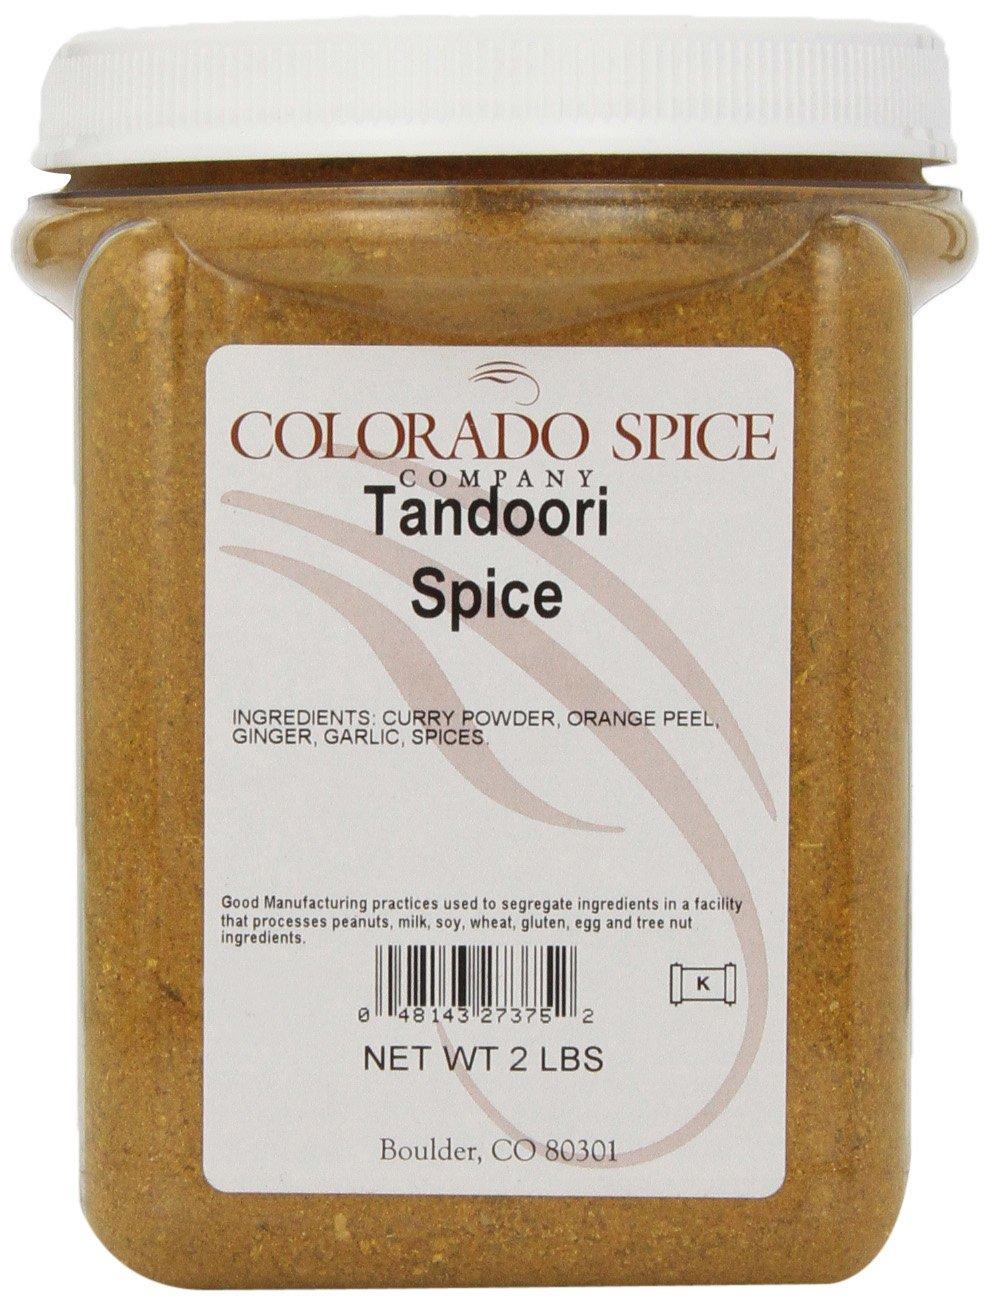 Colorado Spice Tandoori Spice, 32-Ounce